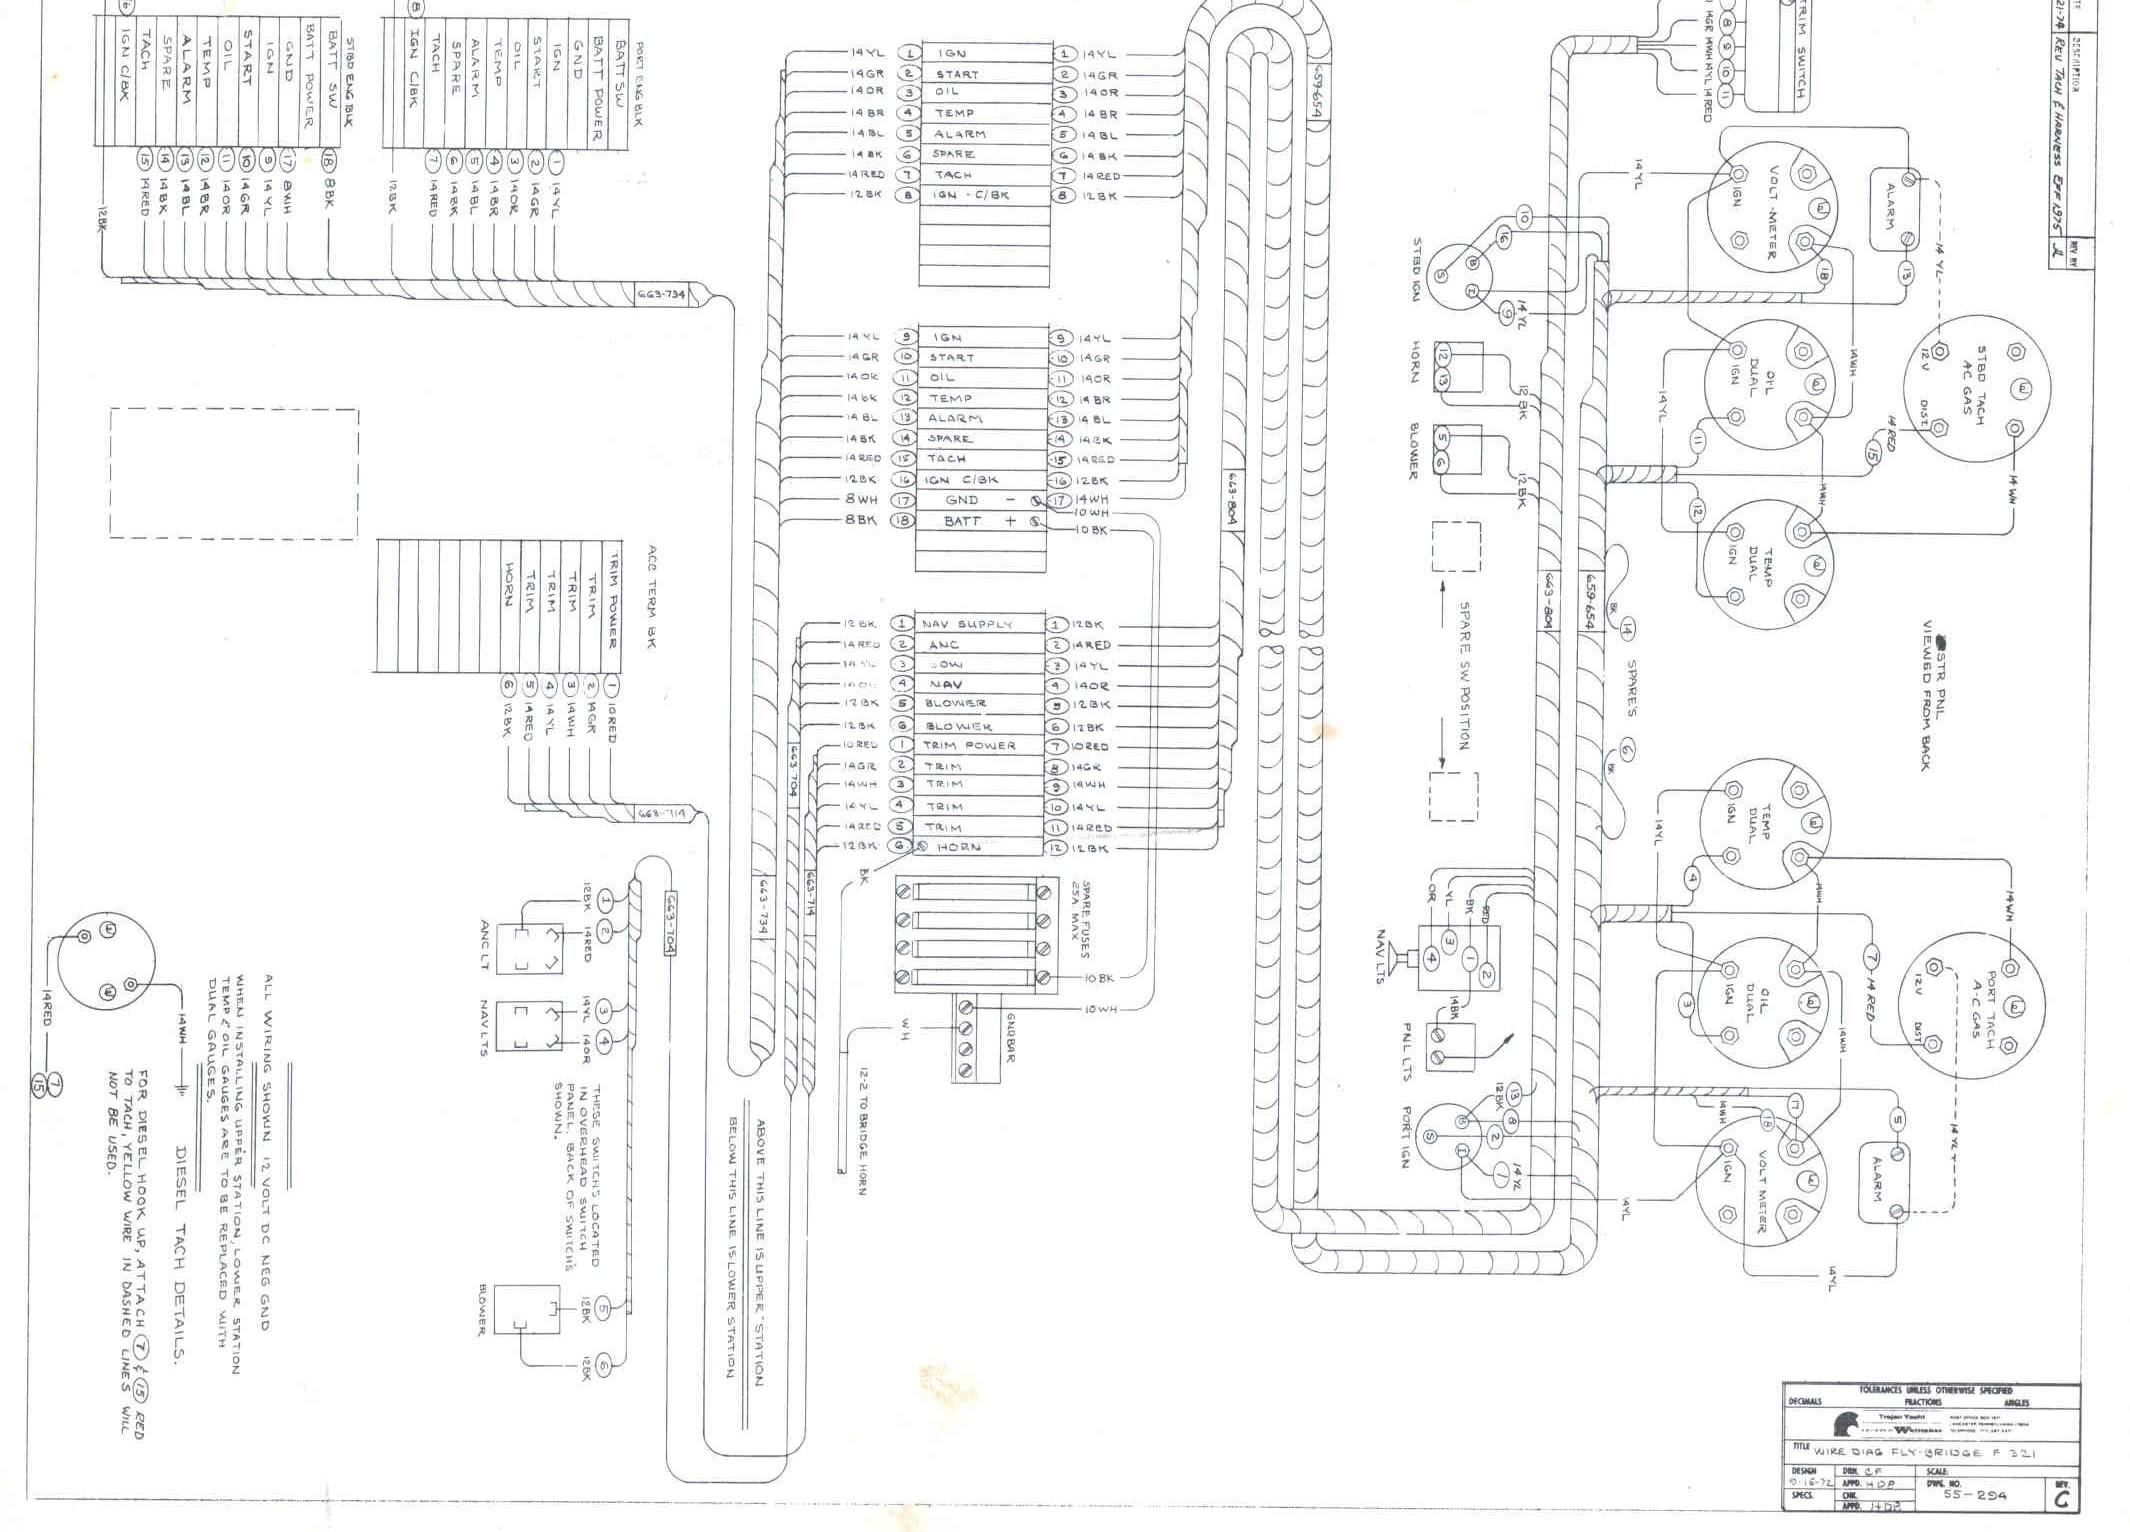 Original F 32 Schematics And Wiring Diagrams